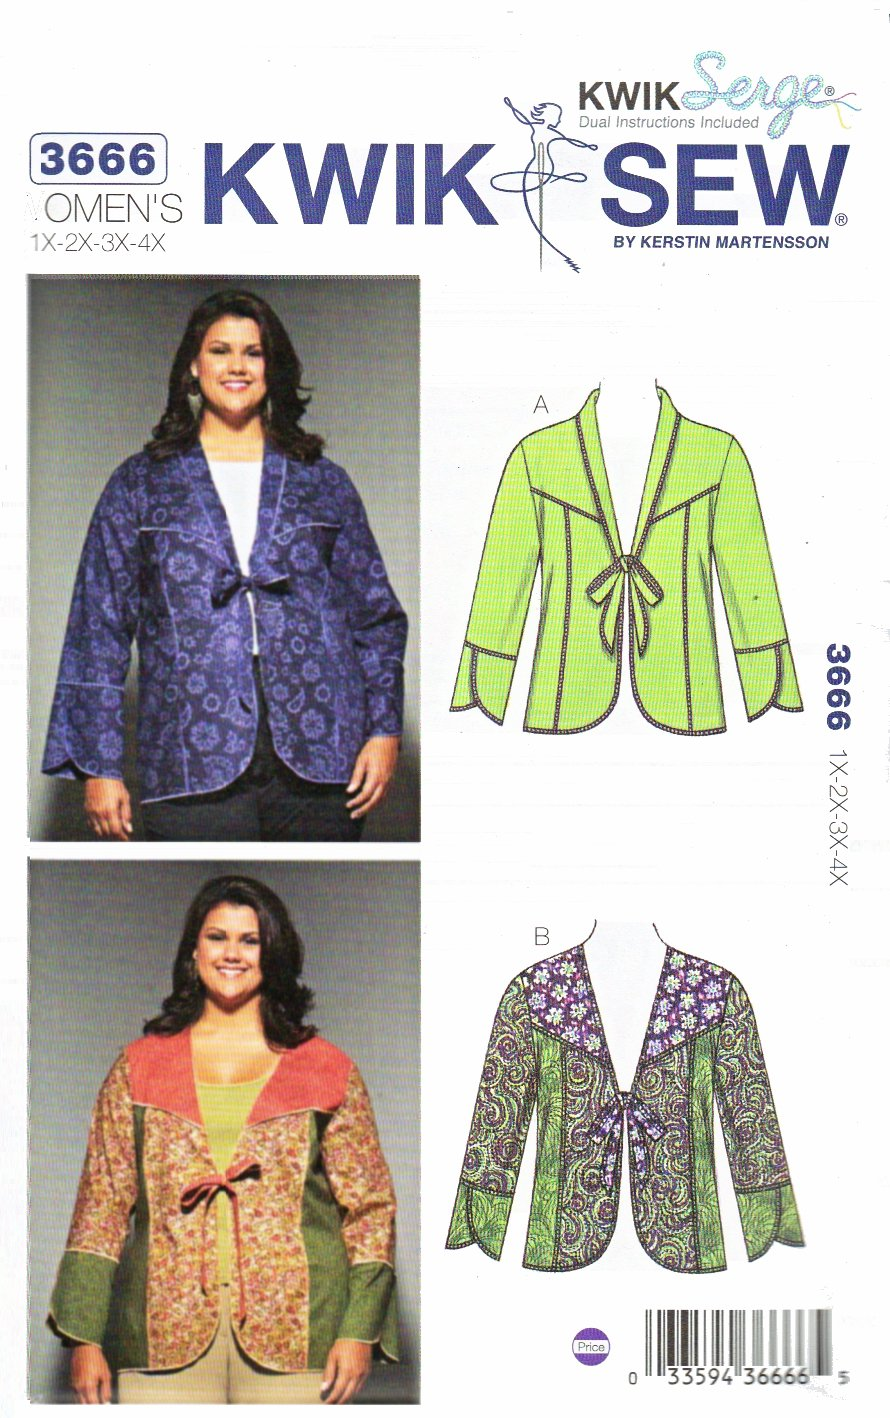 Kwik Sew Sewing Pattern 3666 Women's Plus Sizes 1X-4X Color Block Seam Detail Jacket